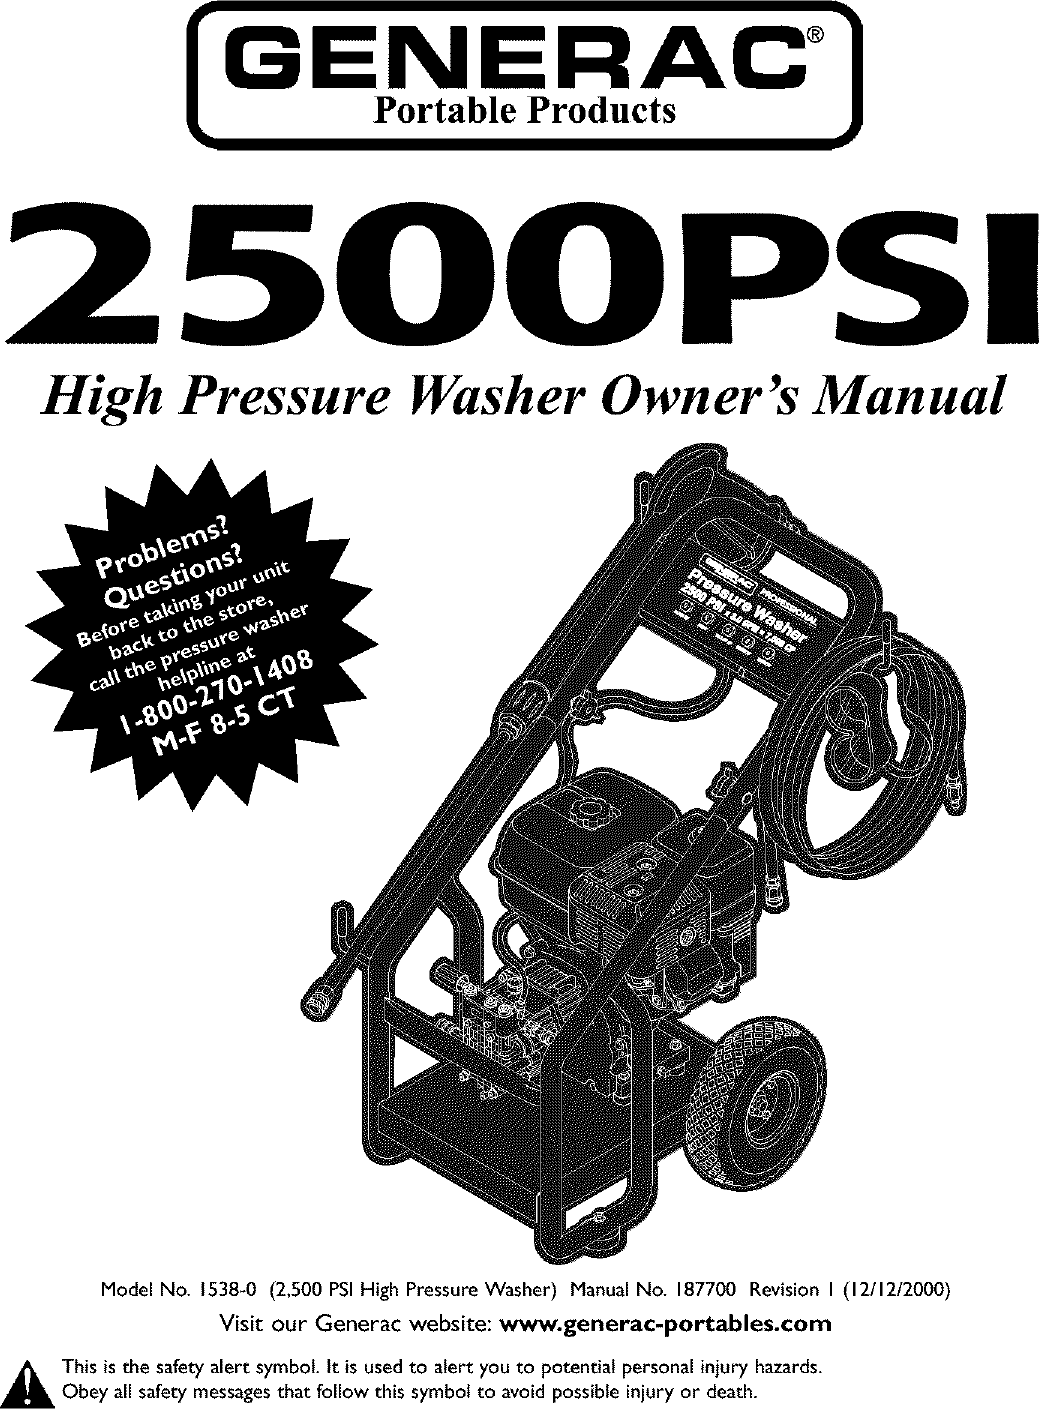 Generac 1538 0 User Manual PRESSURE WASHER Manuals And